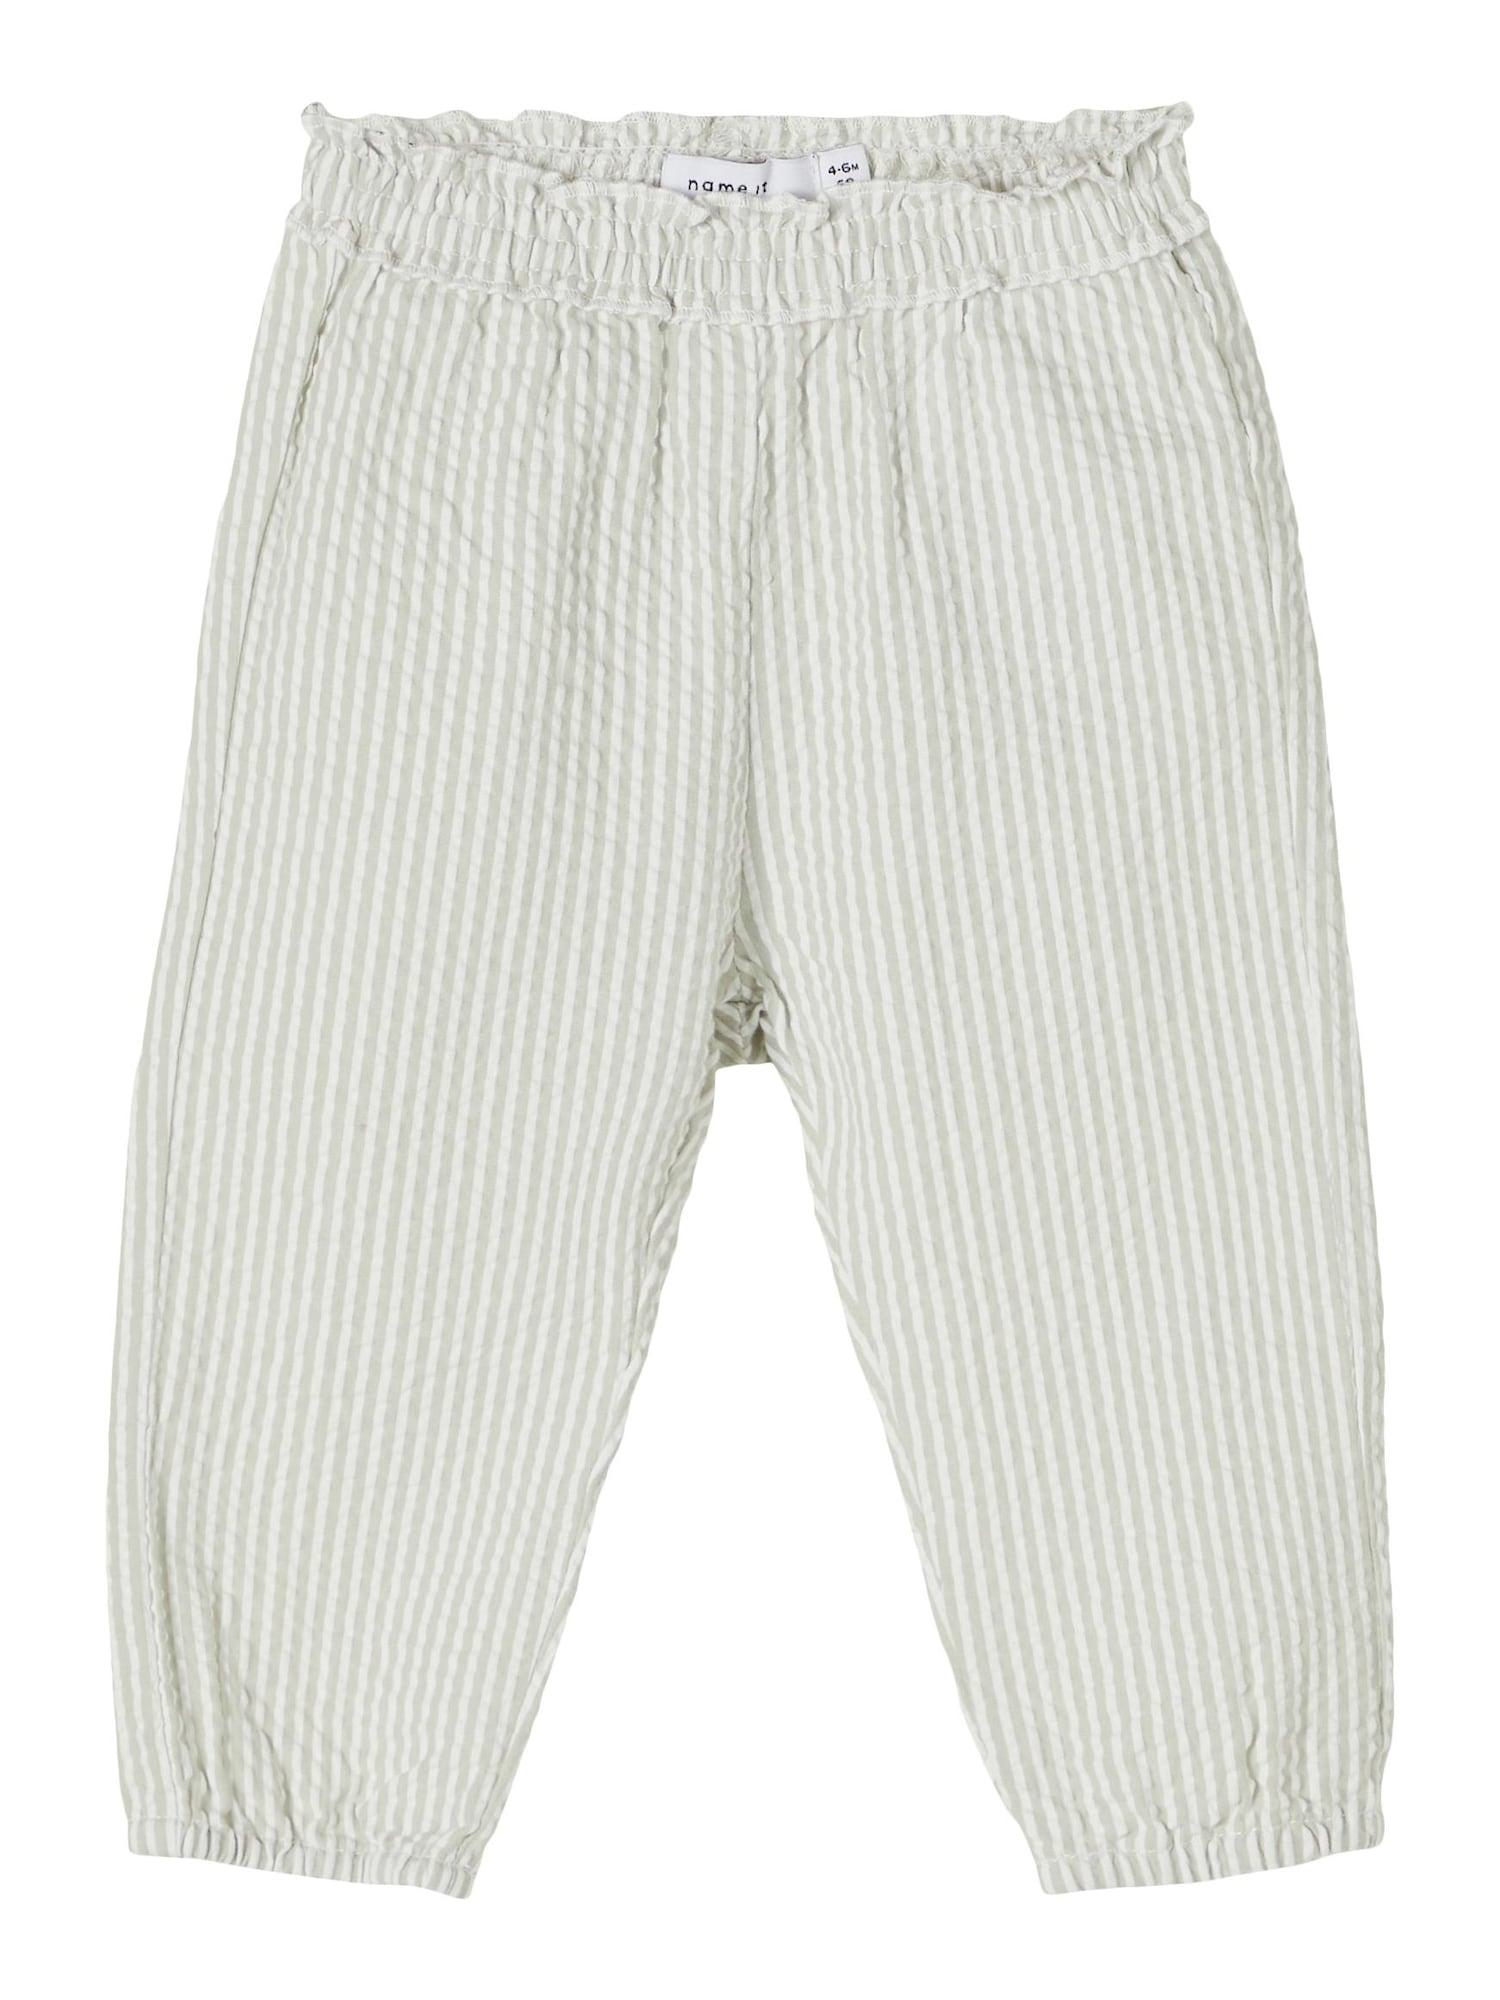 NAME IT Kelnės 'Filur' pastelinė žalia / balta